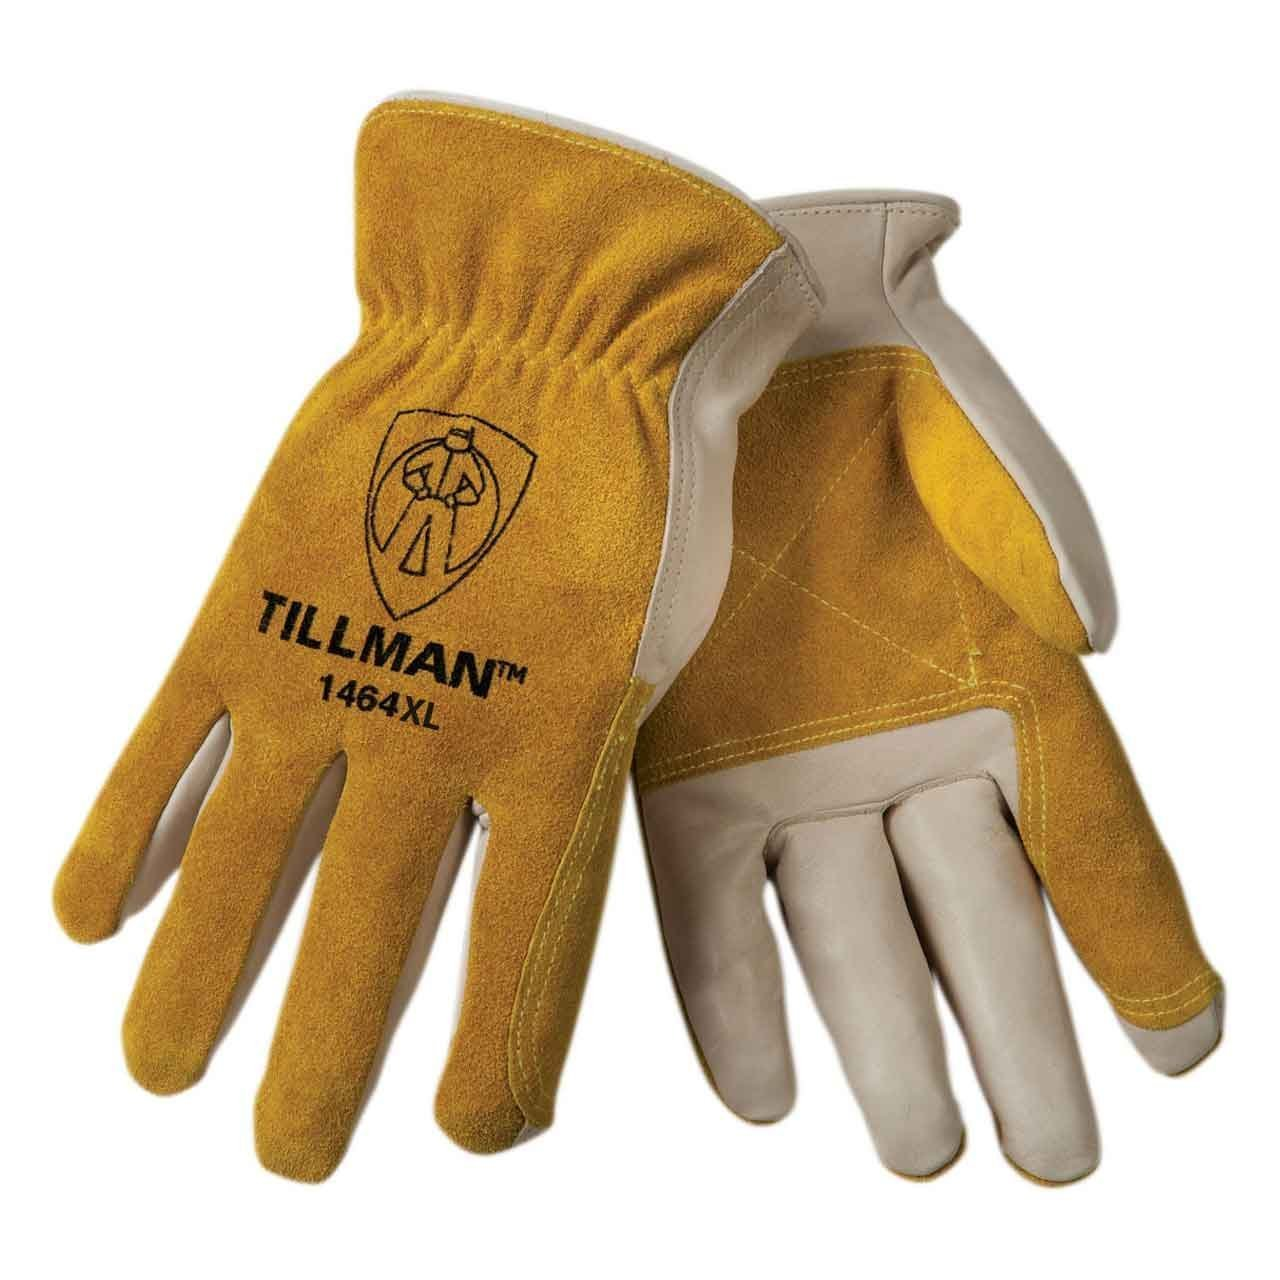 Tillman 1464 Top Grain Cowhide/Split Drivers Gloves - XLarge